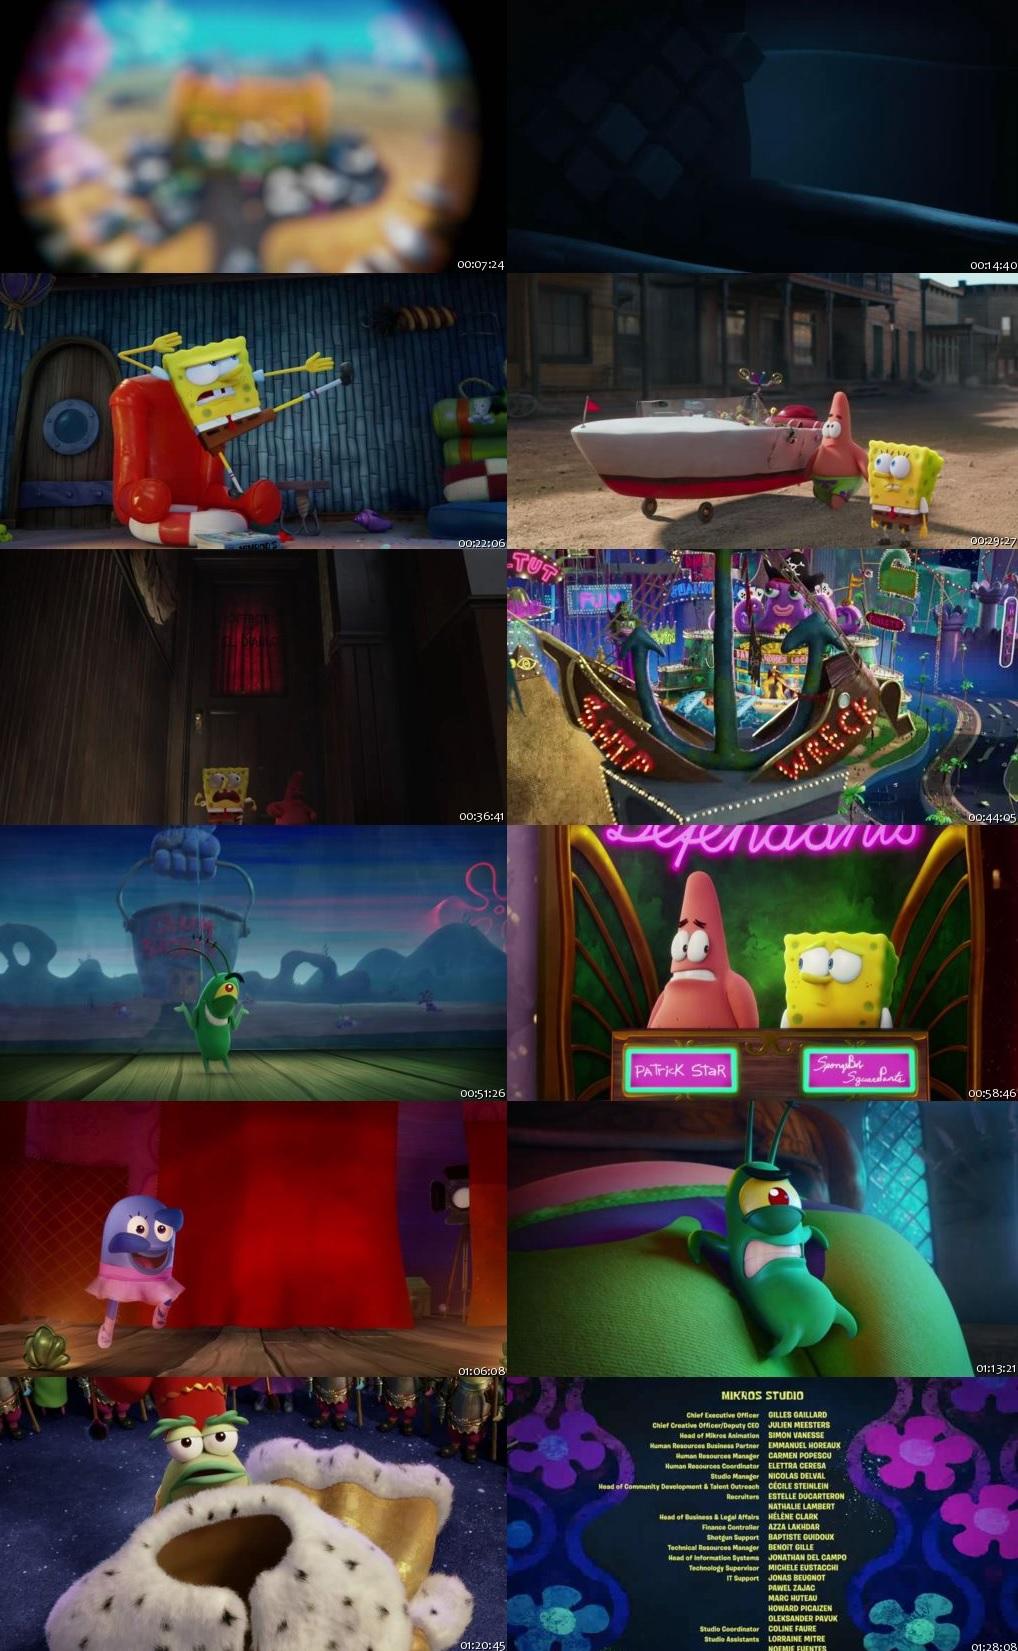 The SpongeBob Movie: Sponge on the Run 2020